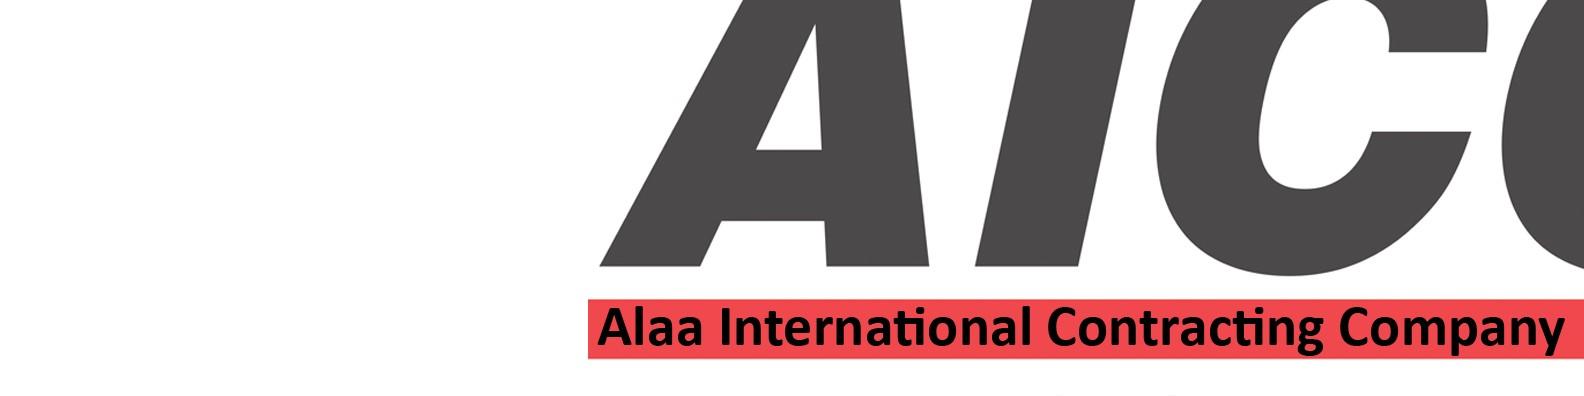 Alaa International Contracting Company (AICCO) | LinkedIn